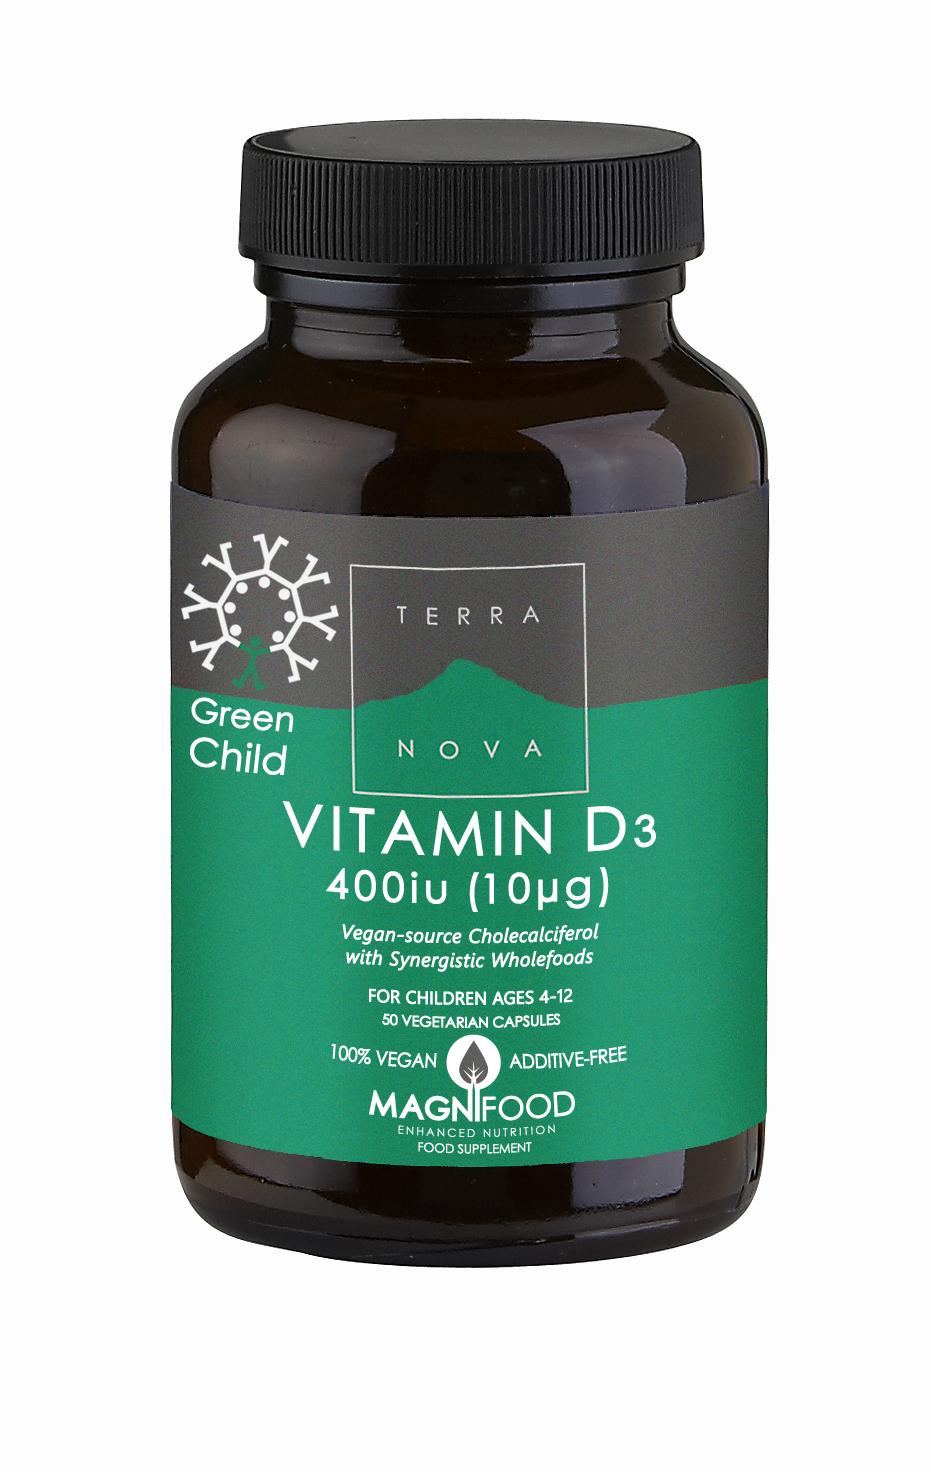 Green Child Vitamin D3 400iu 50's